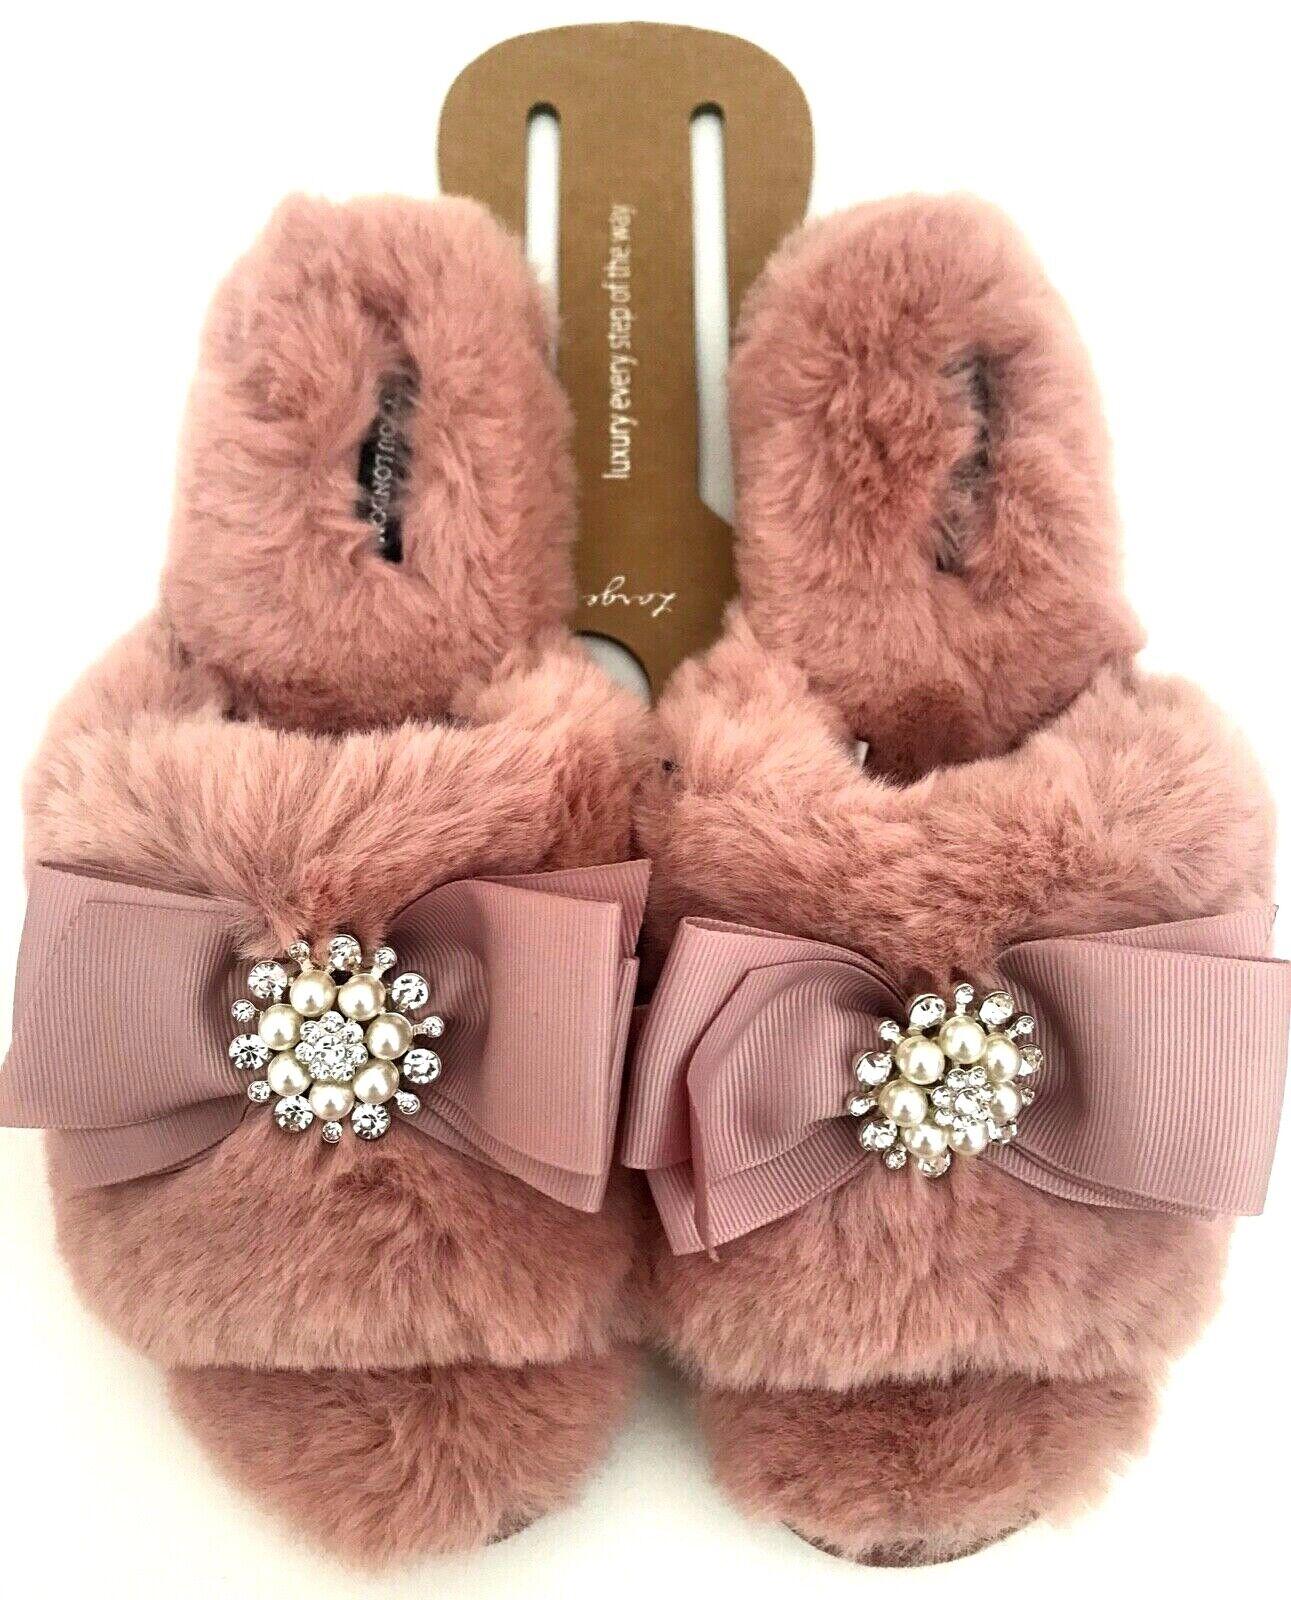 Pretty You London Elegant Women Slip-On Slippers Jeweled, Brides, Mom's, PINK